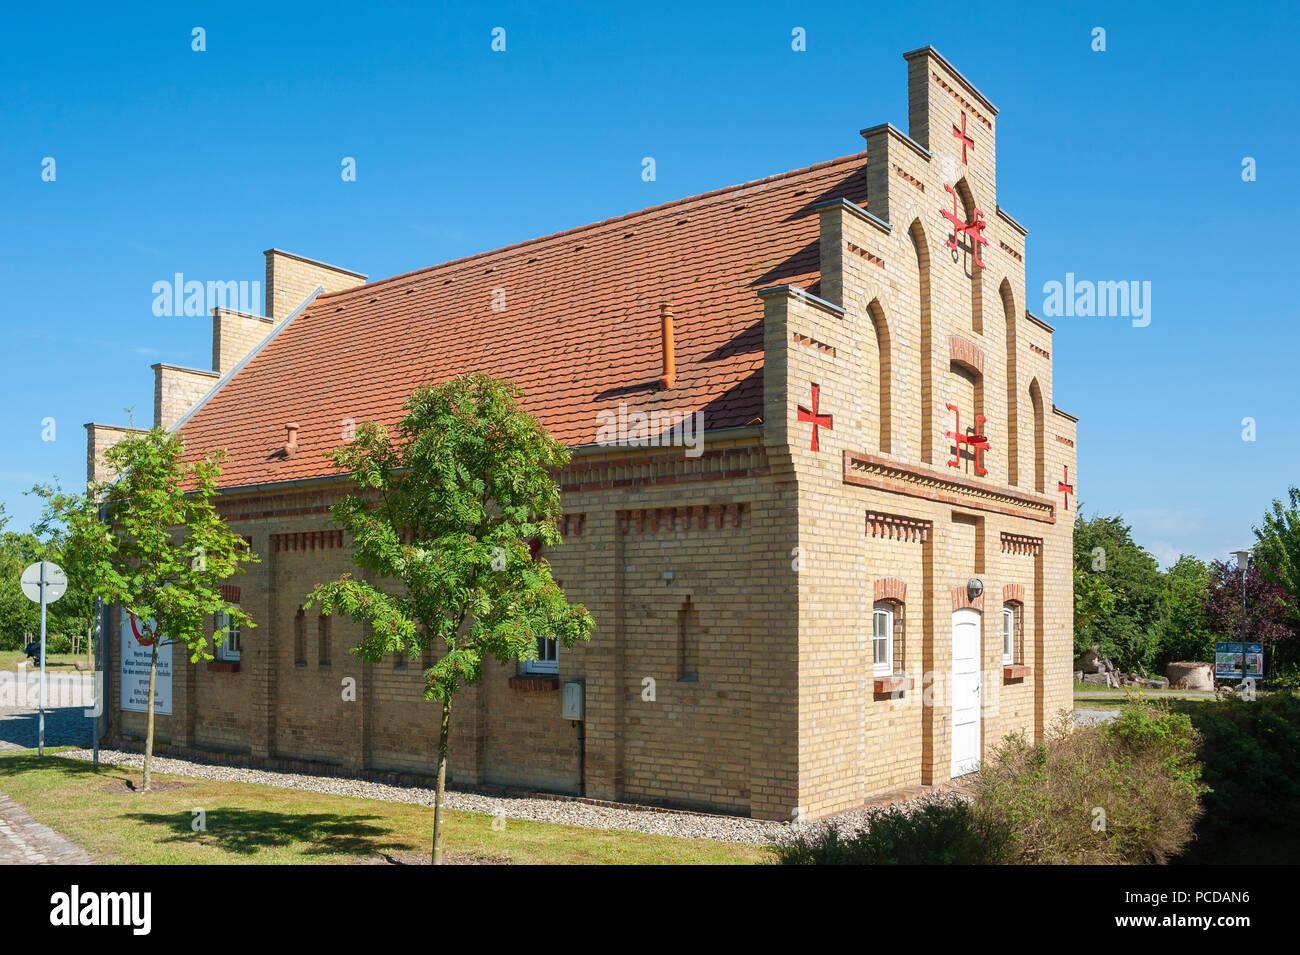 Building of the volunteer fire department Putgarten, Cape Arkona, Rügen, Mecklenburg-Vorpommern, Germany, Europe - Stock Image